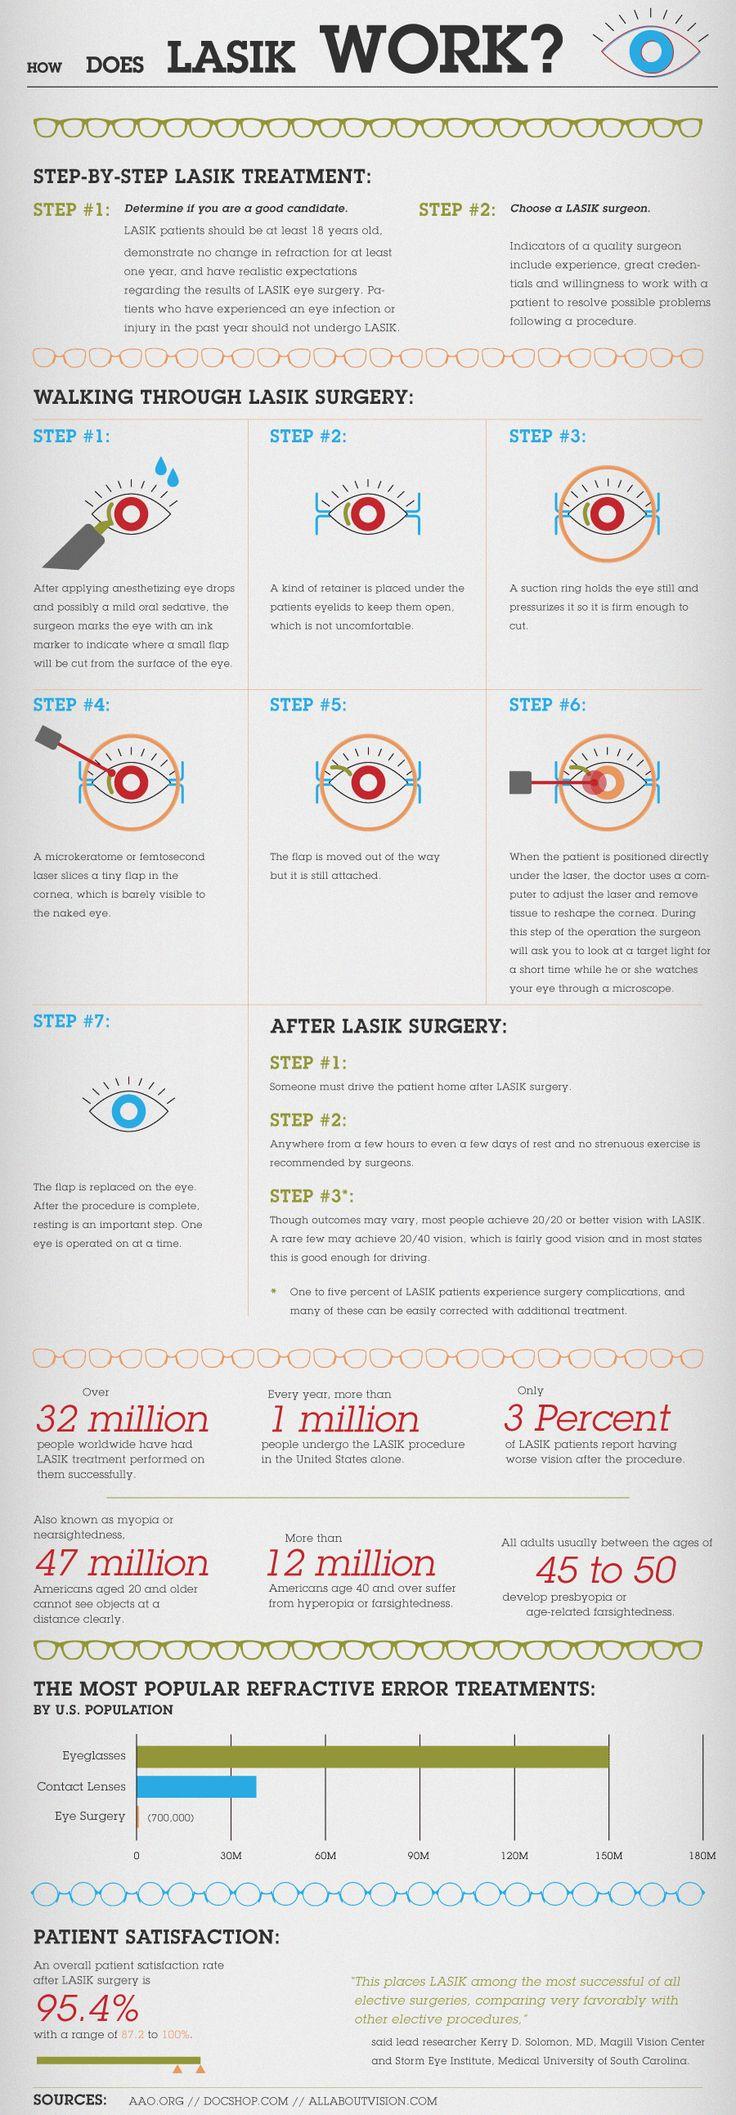 How LASIK Works